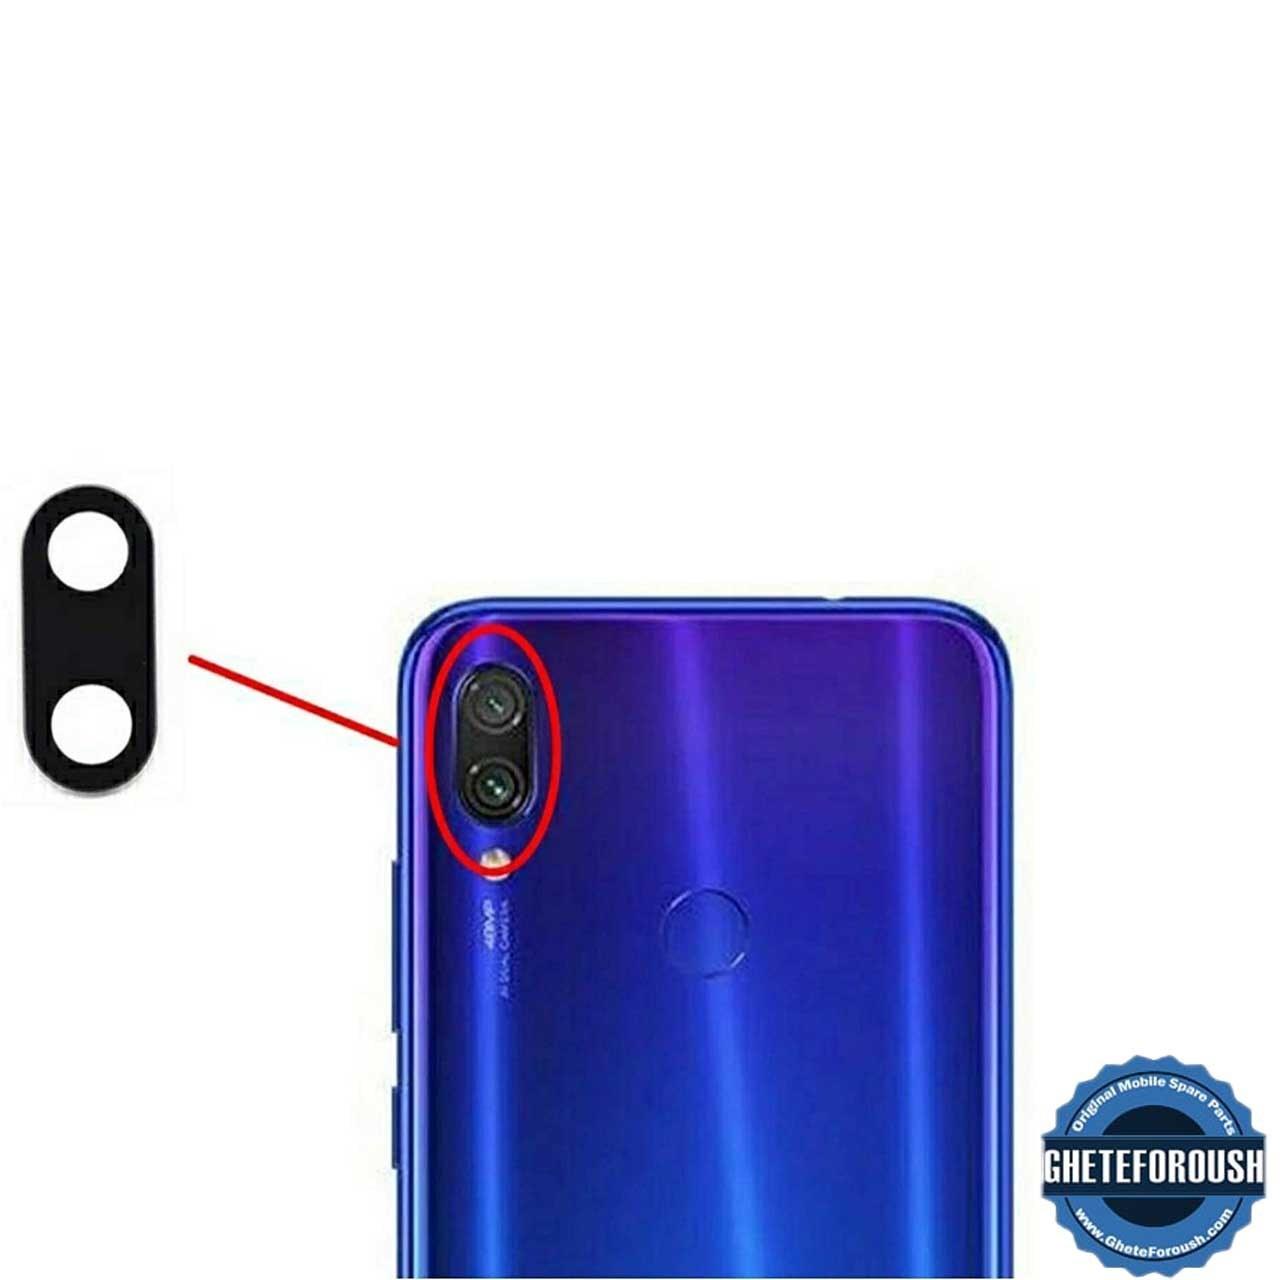 تصویر شیشه دوربین شیائومی xiaomi redmi note 7 ا Xiaomi redmi note 7 camera glass Xiaomi redmi note 7 camera glass